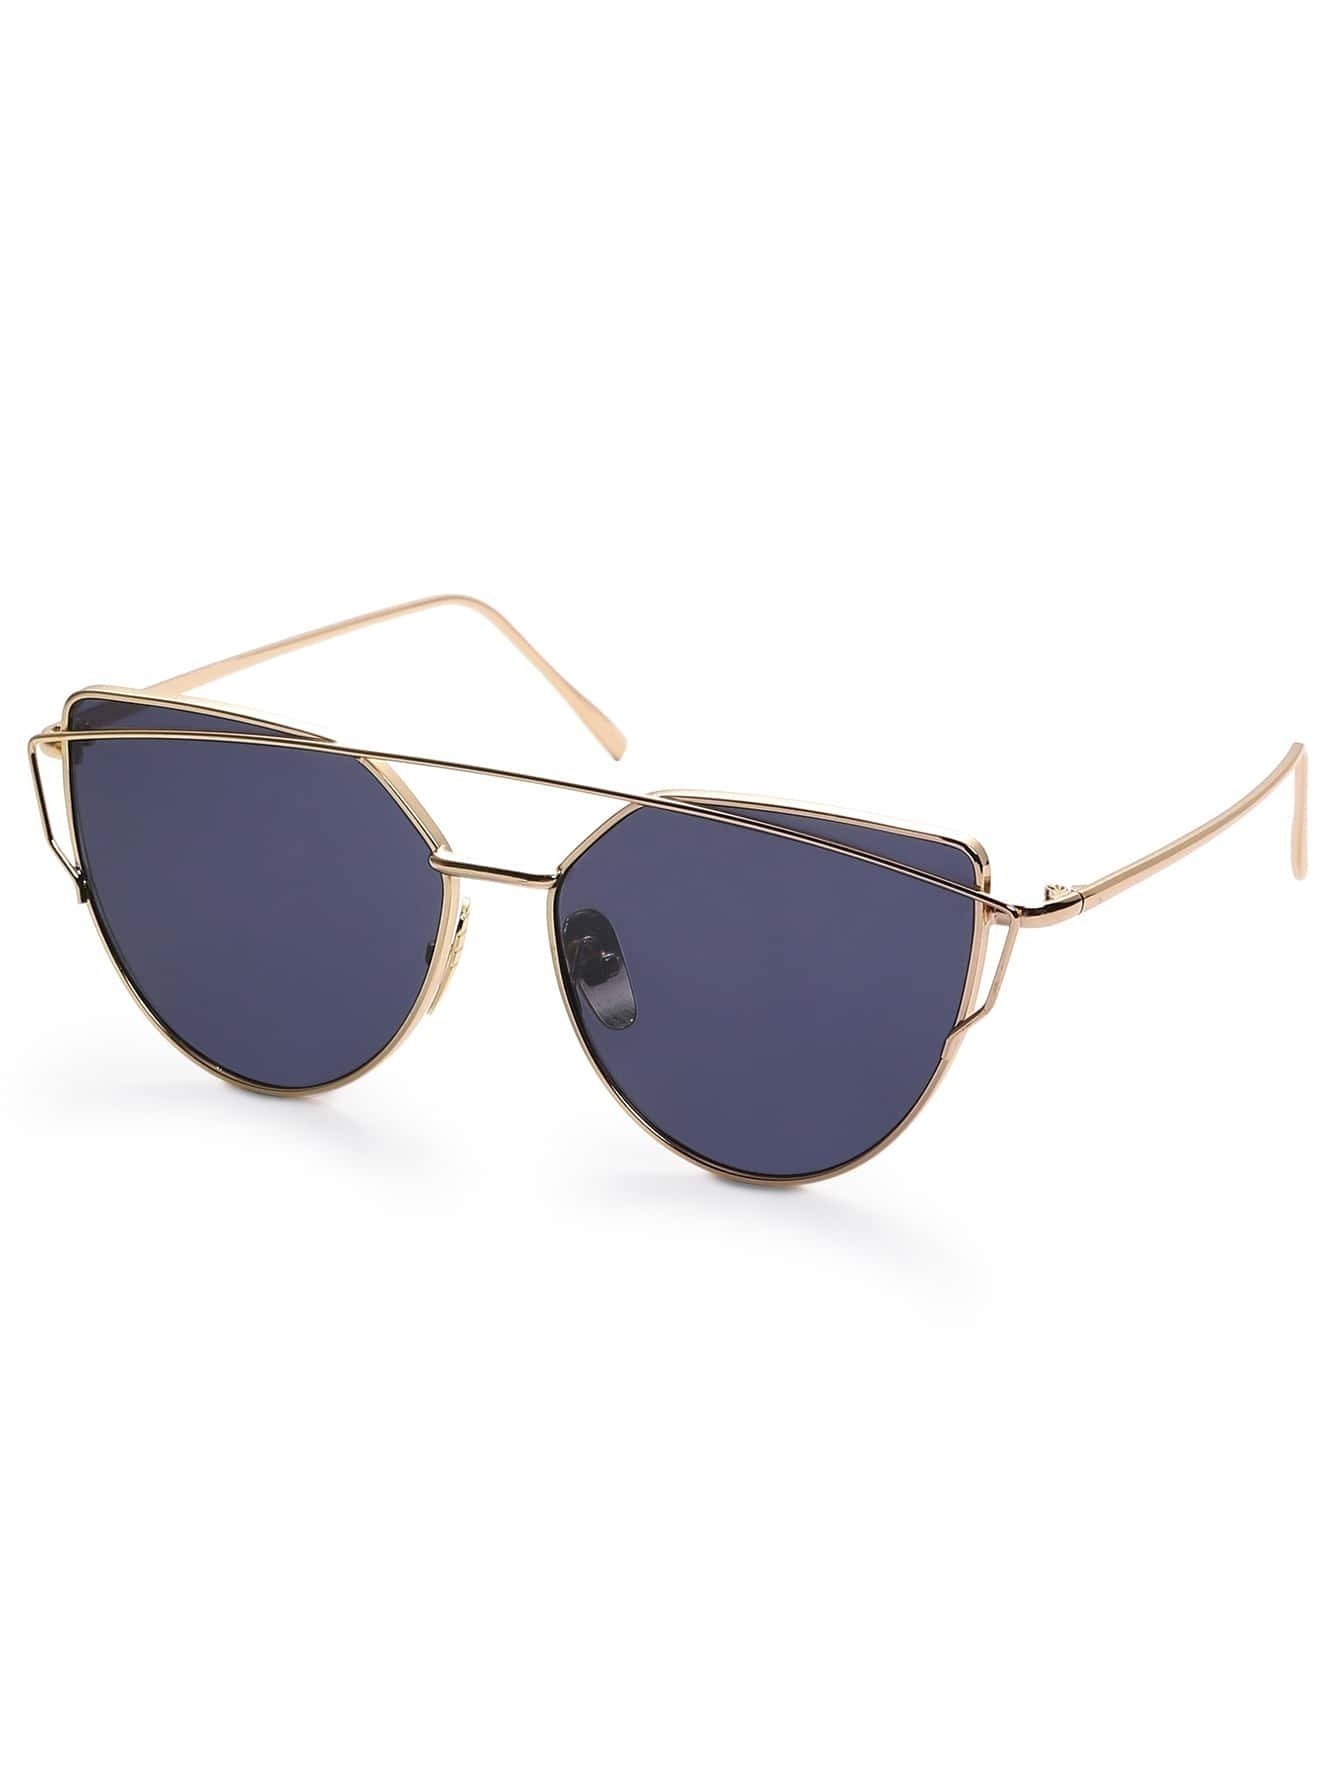 Golden Frame Black Sunglasses : Gold Frame Black Reflective Lenses Sunglasses EmmaCloth ...